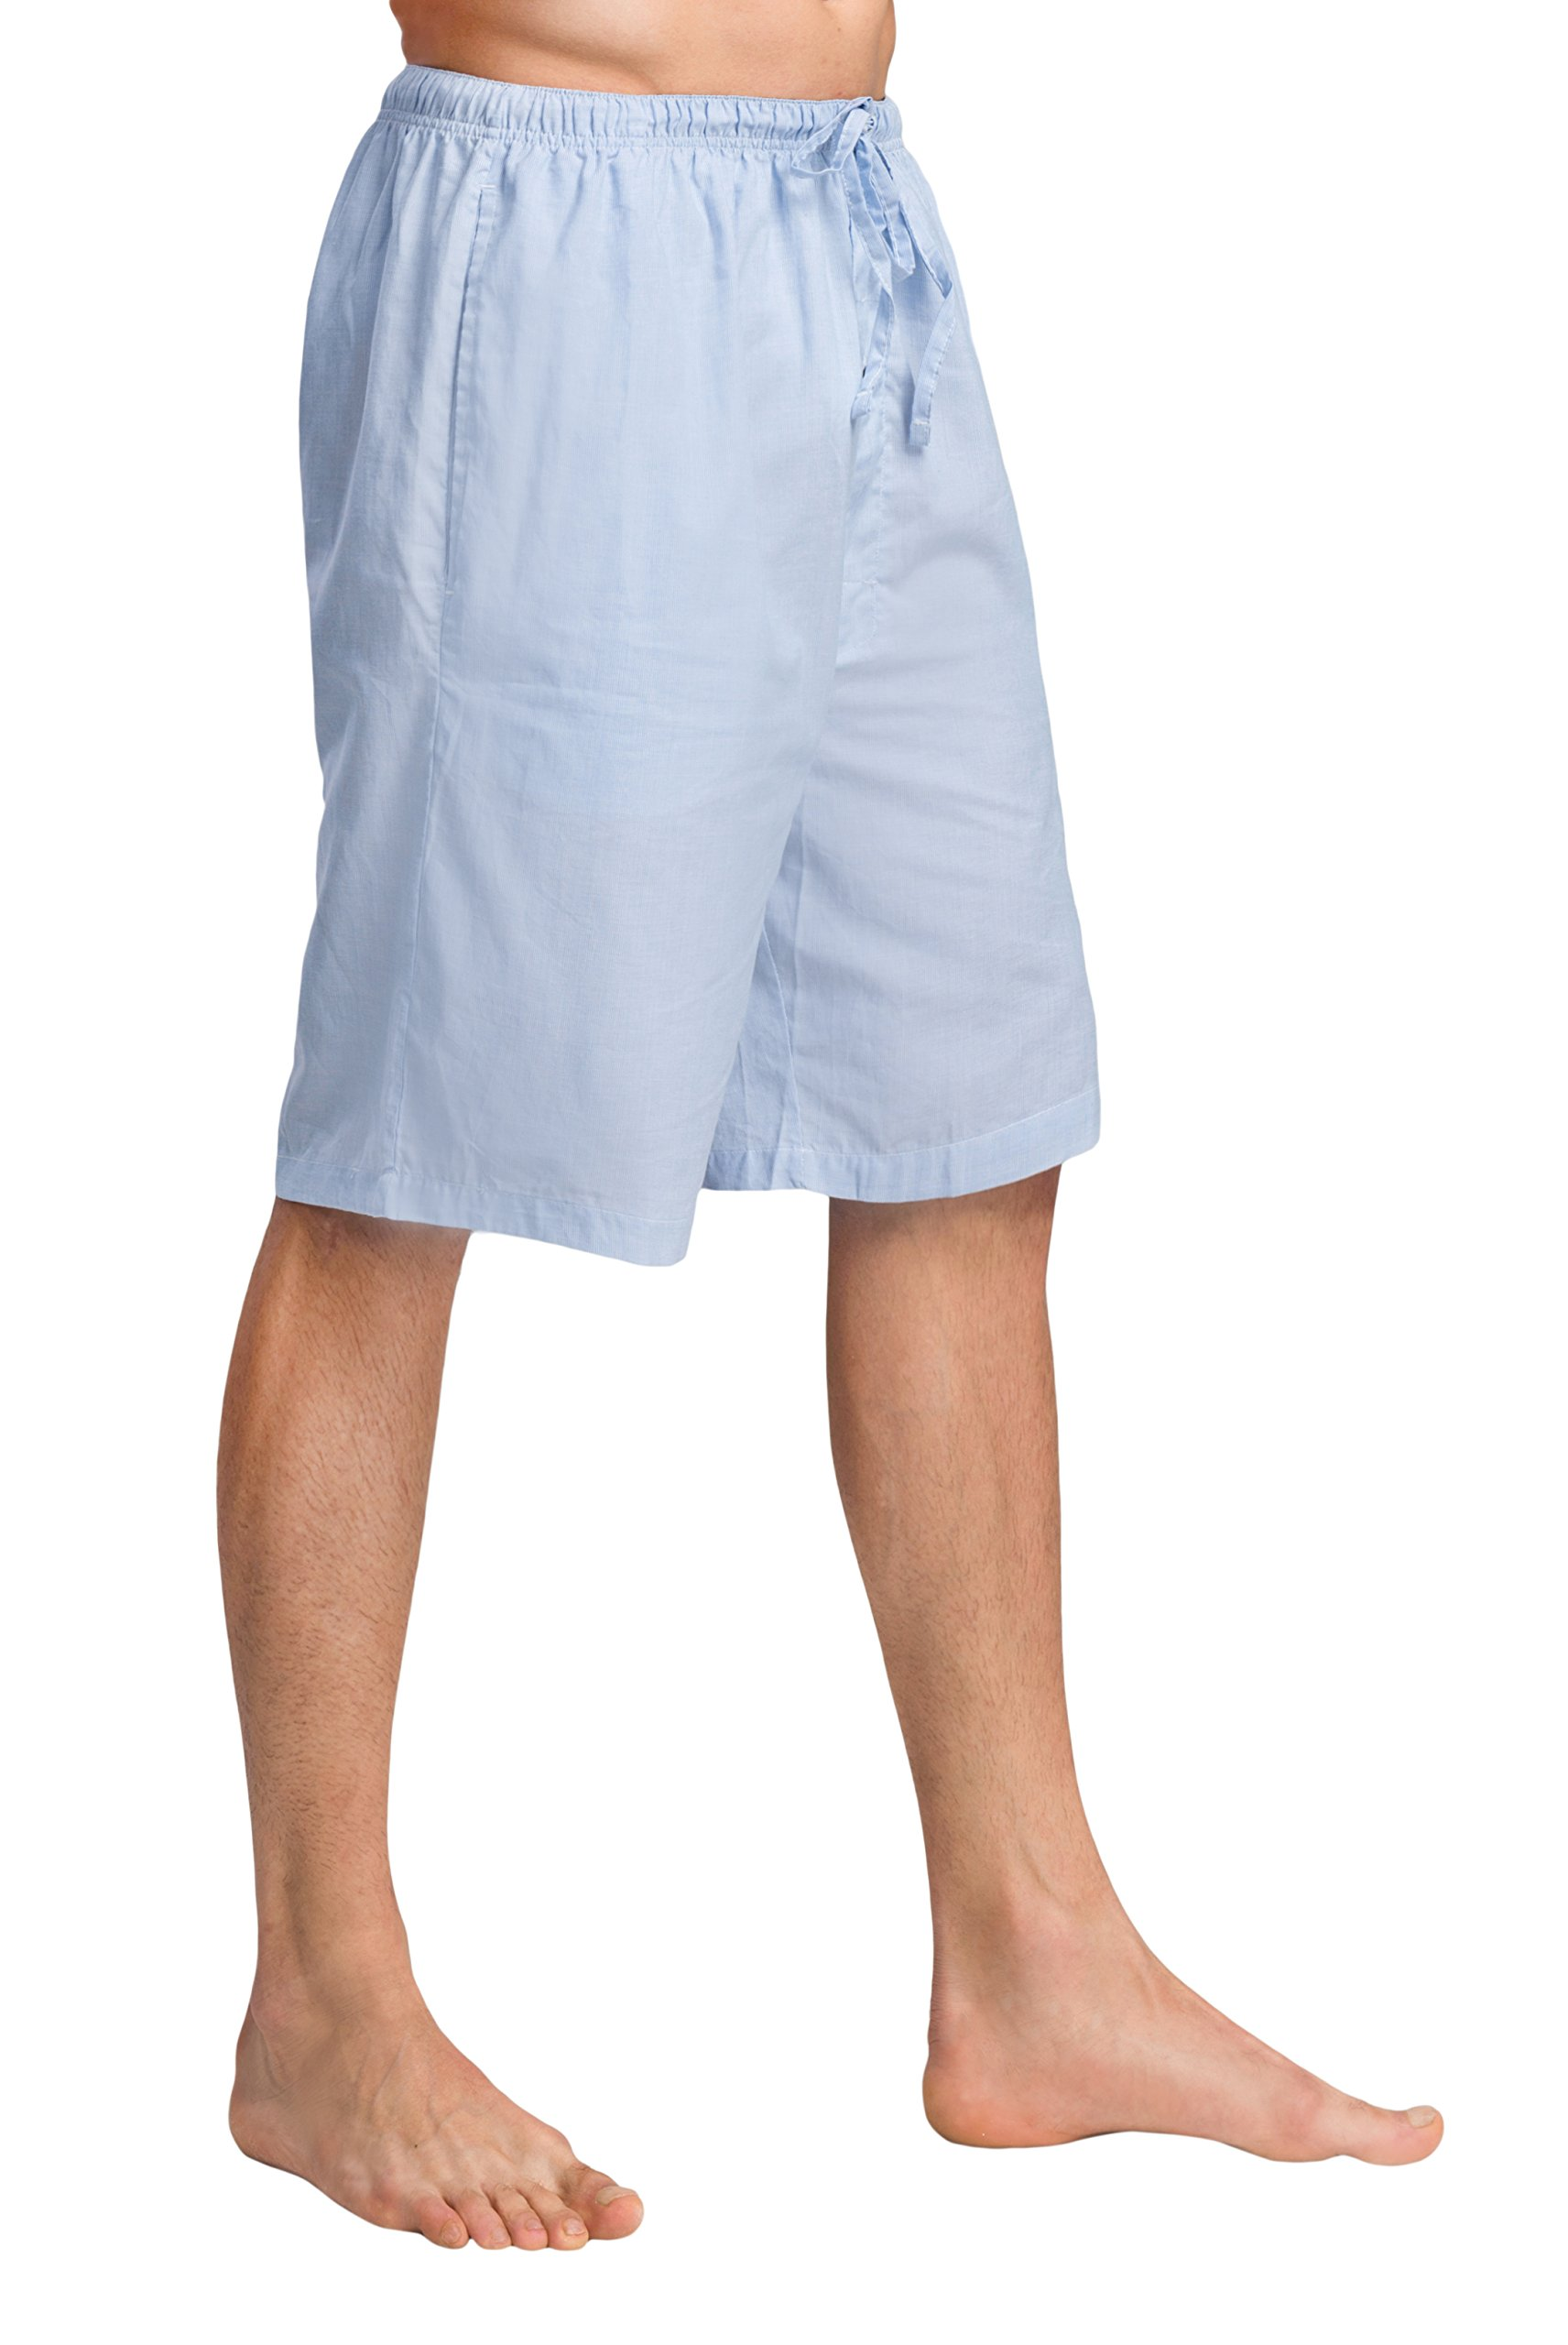 CYZ Men's 100% Cotton Plaid Poplin Woven Lounge/Sleep Shorts-F1718-M